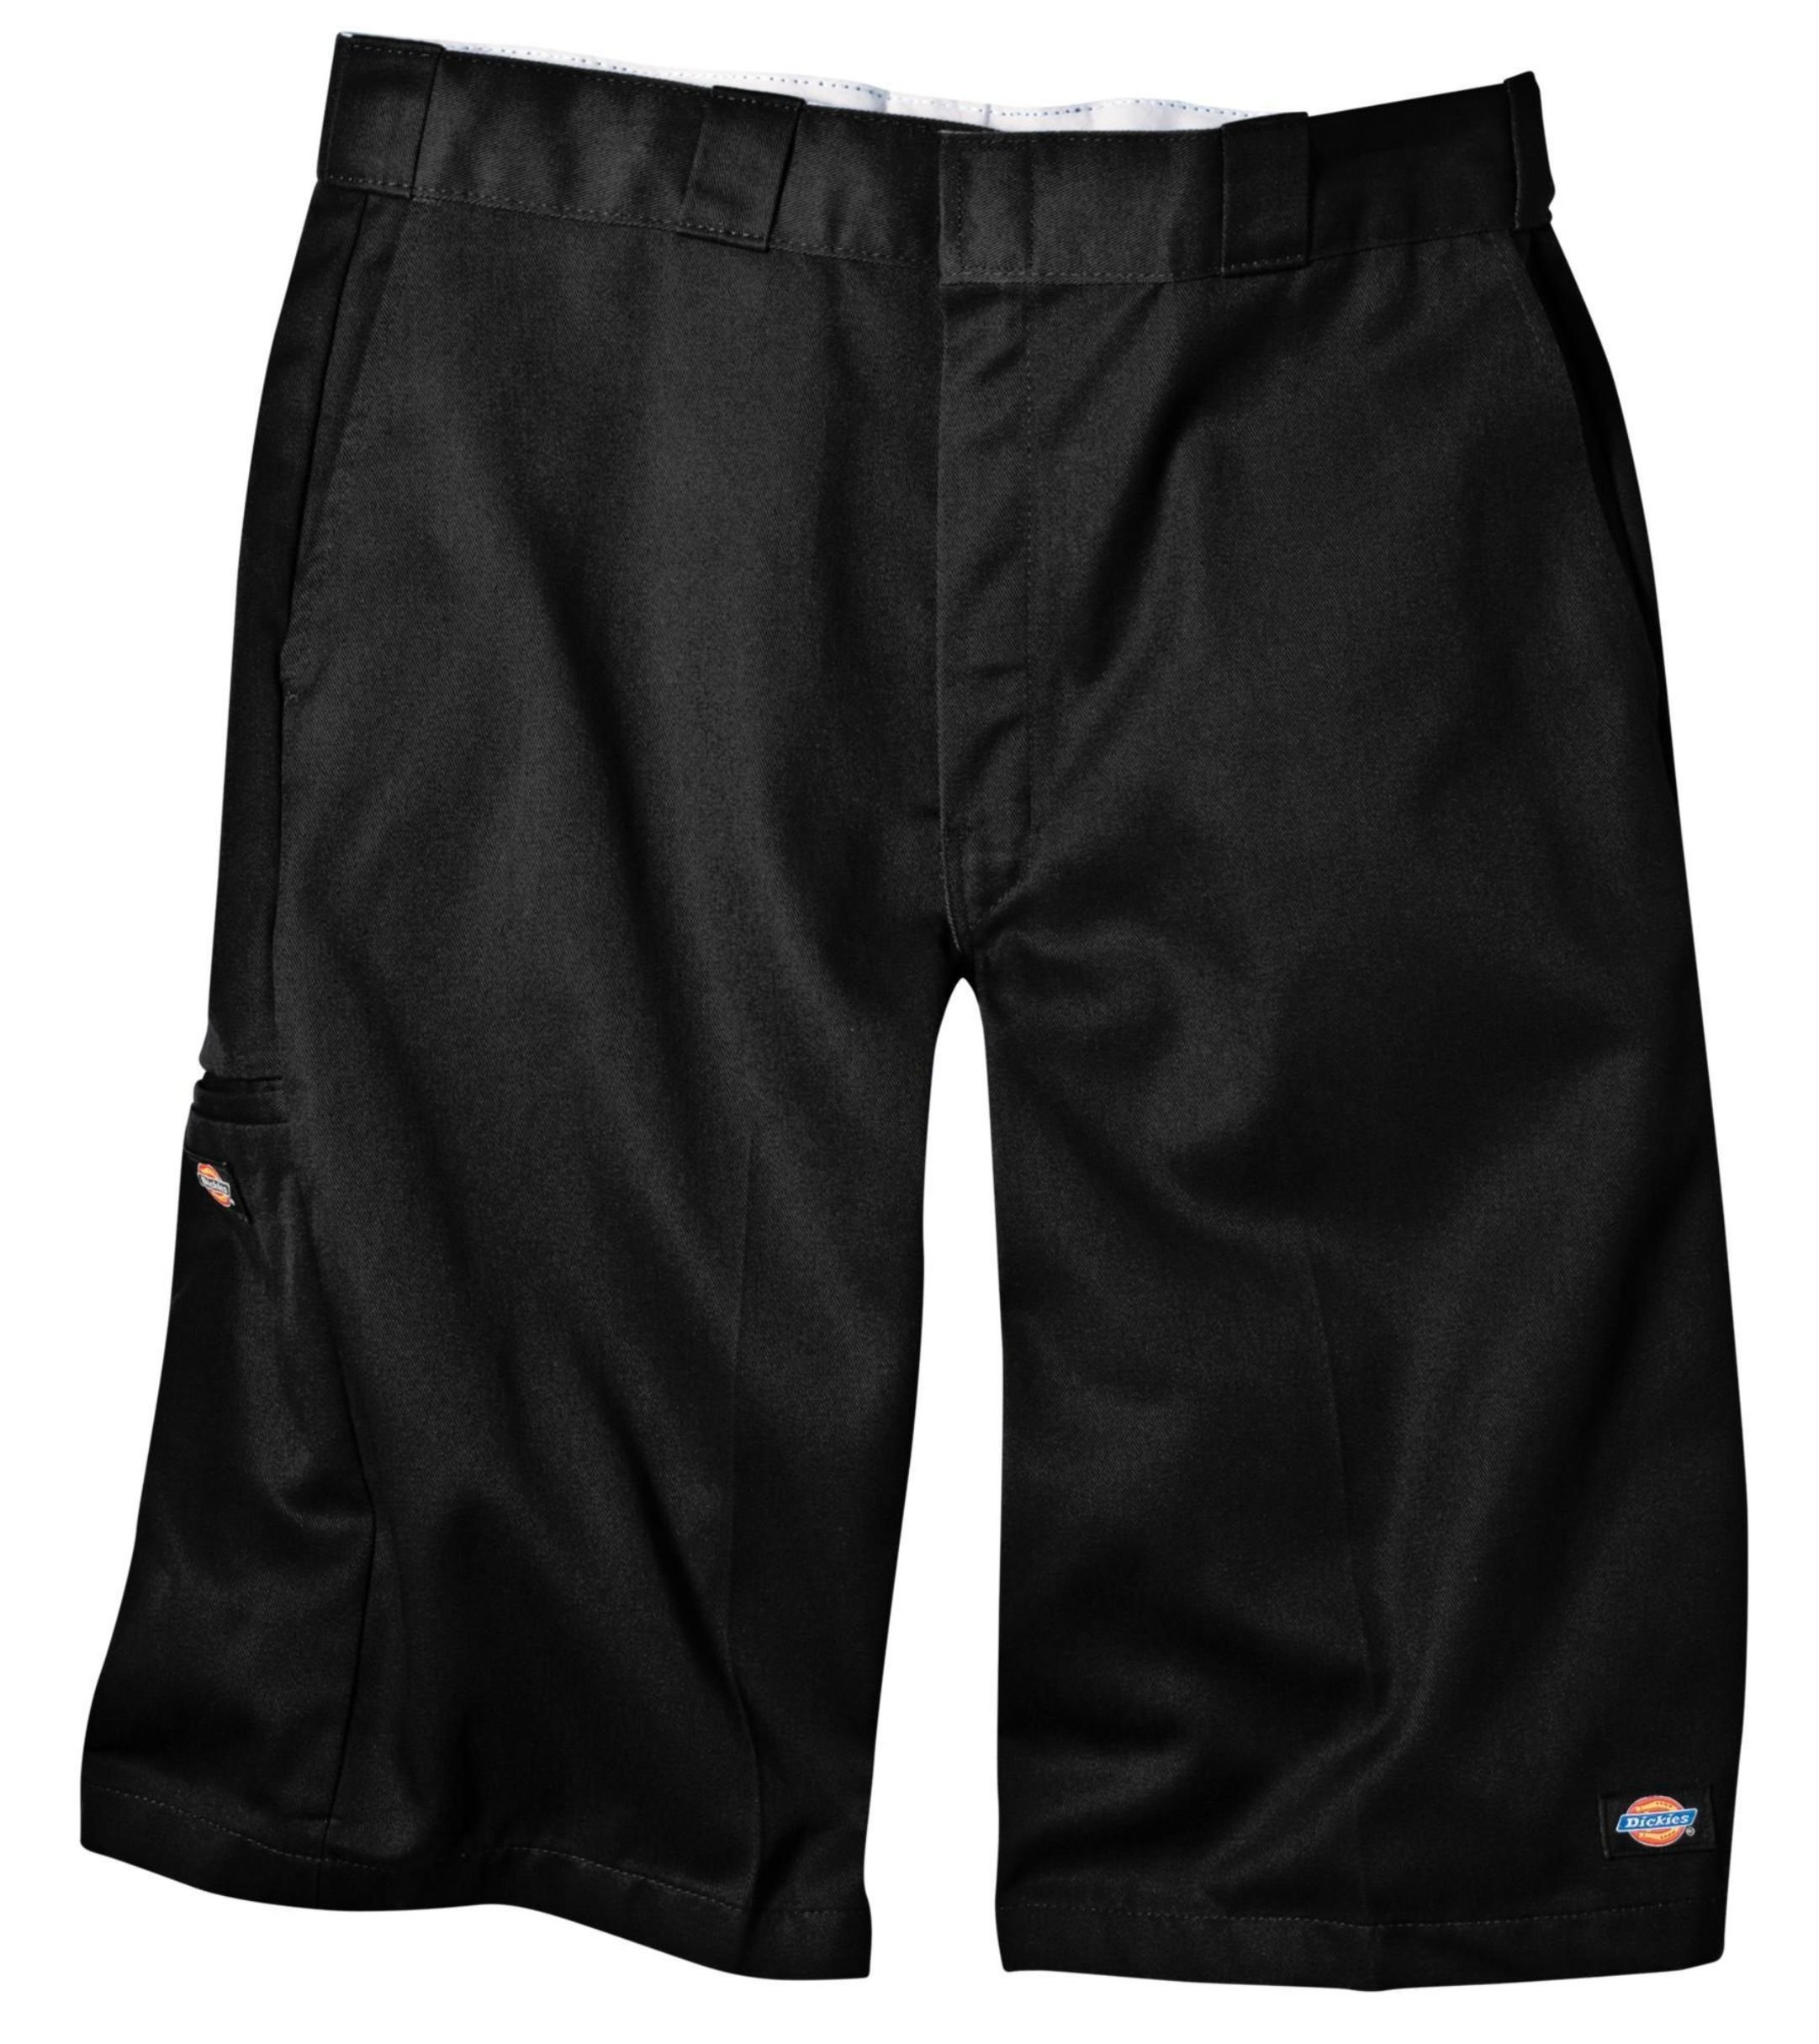 Dickies Men's 13 Inch Loose Fit Multi-Pocket Work Short, Black, 36